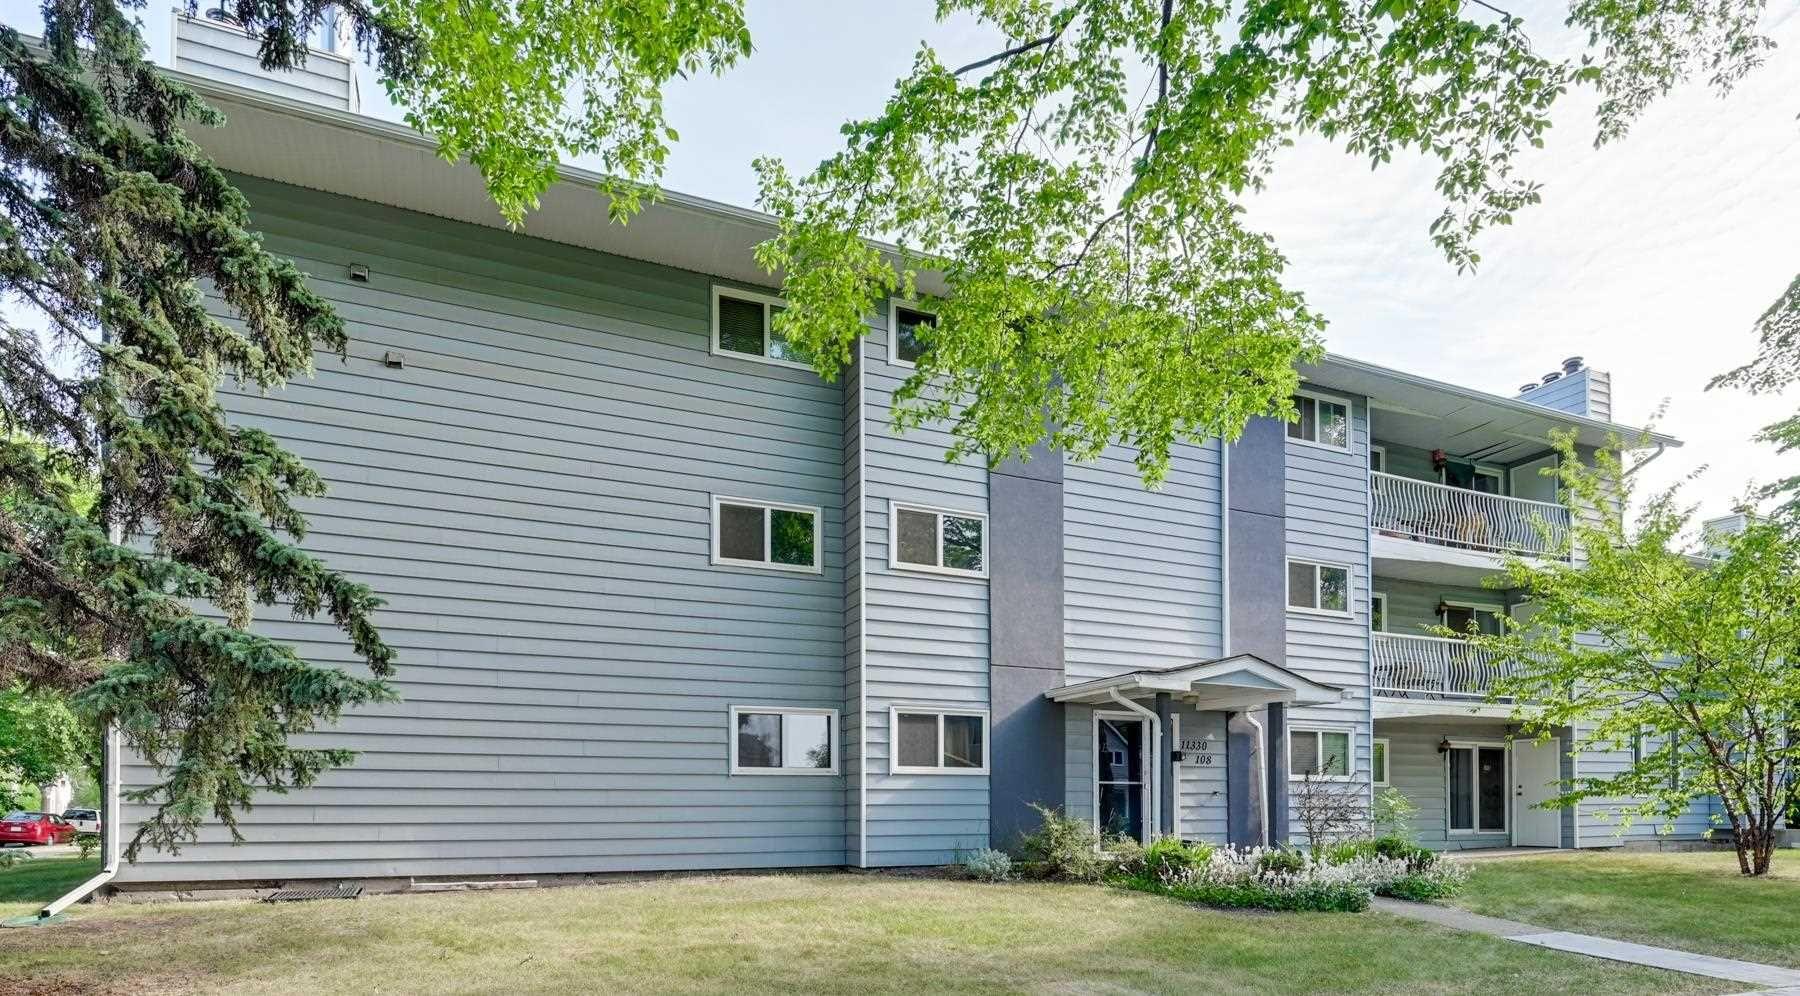 Main Photo: 105 11330 108 Avenue in Edmonton: Zone 08 Townhouse for sale : MLS®# E4254334